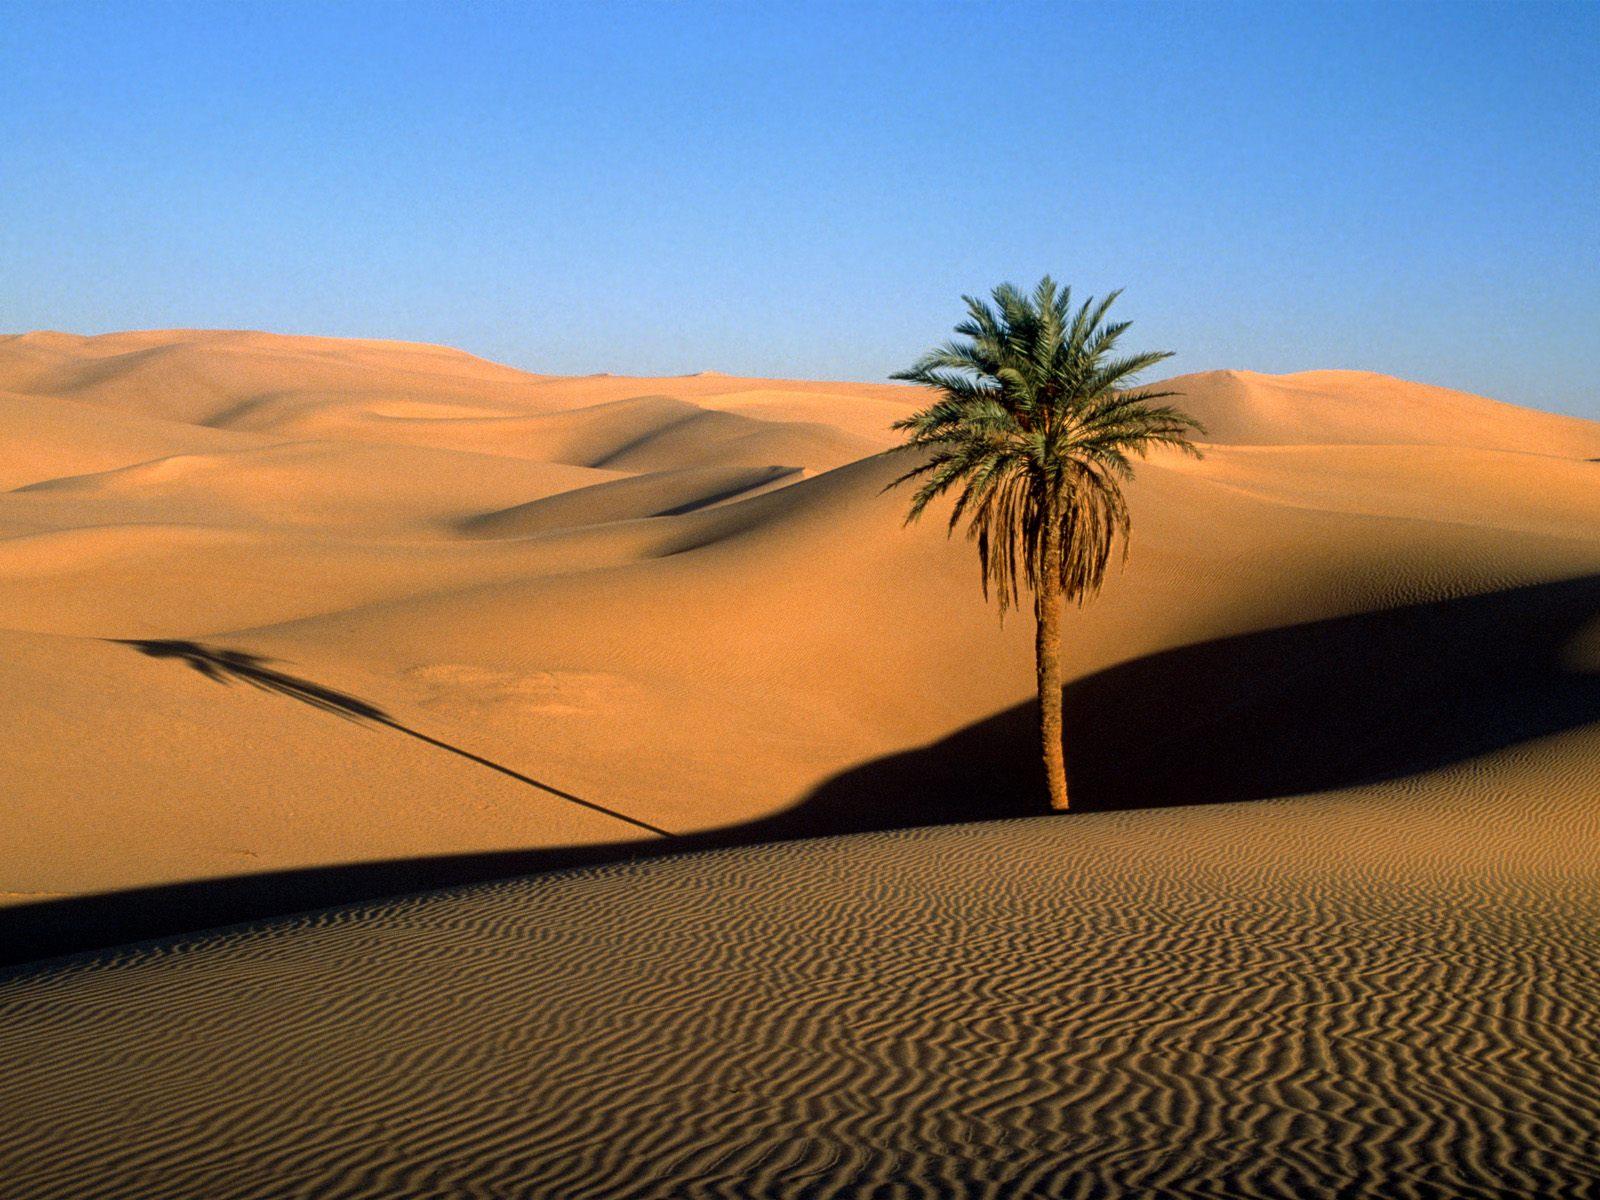 About Sahara Desert